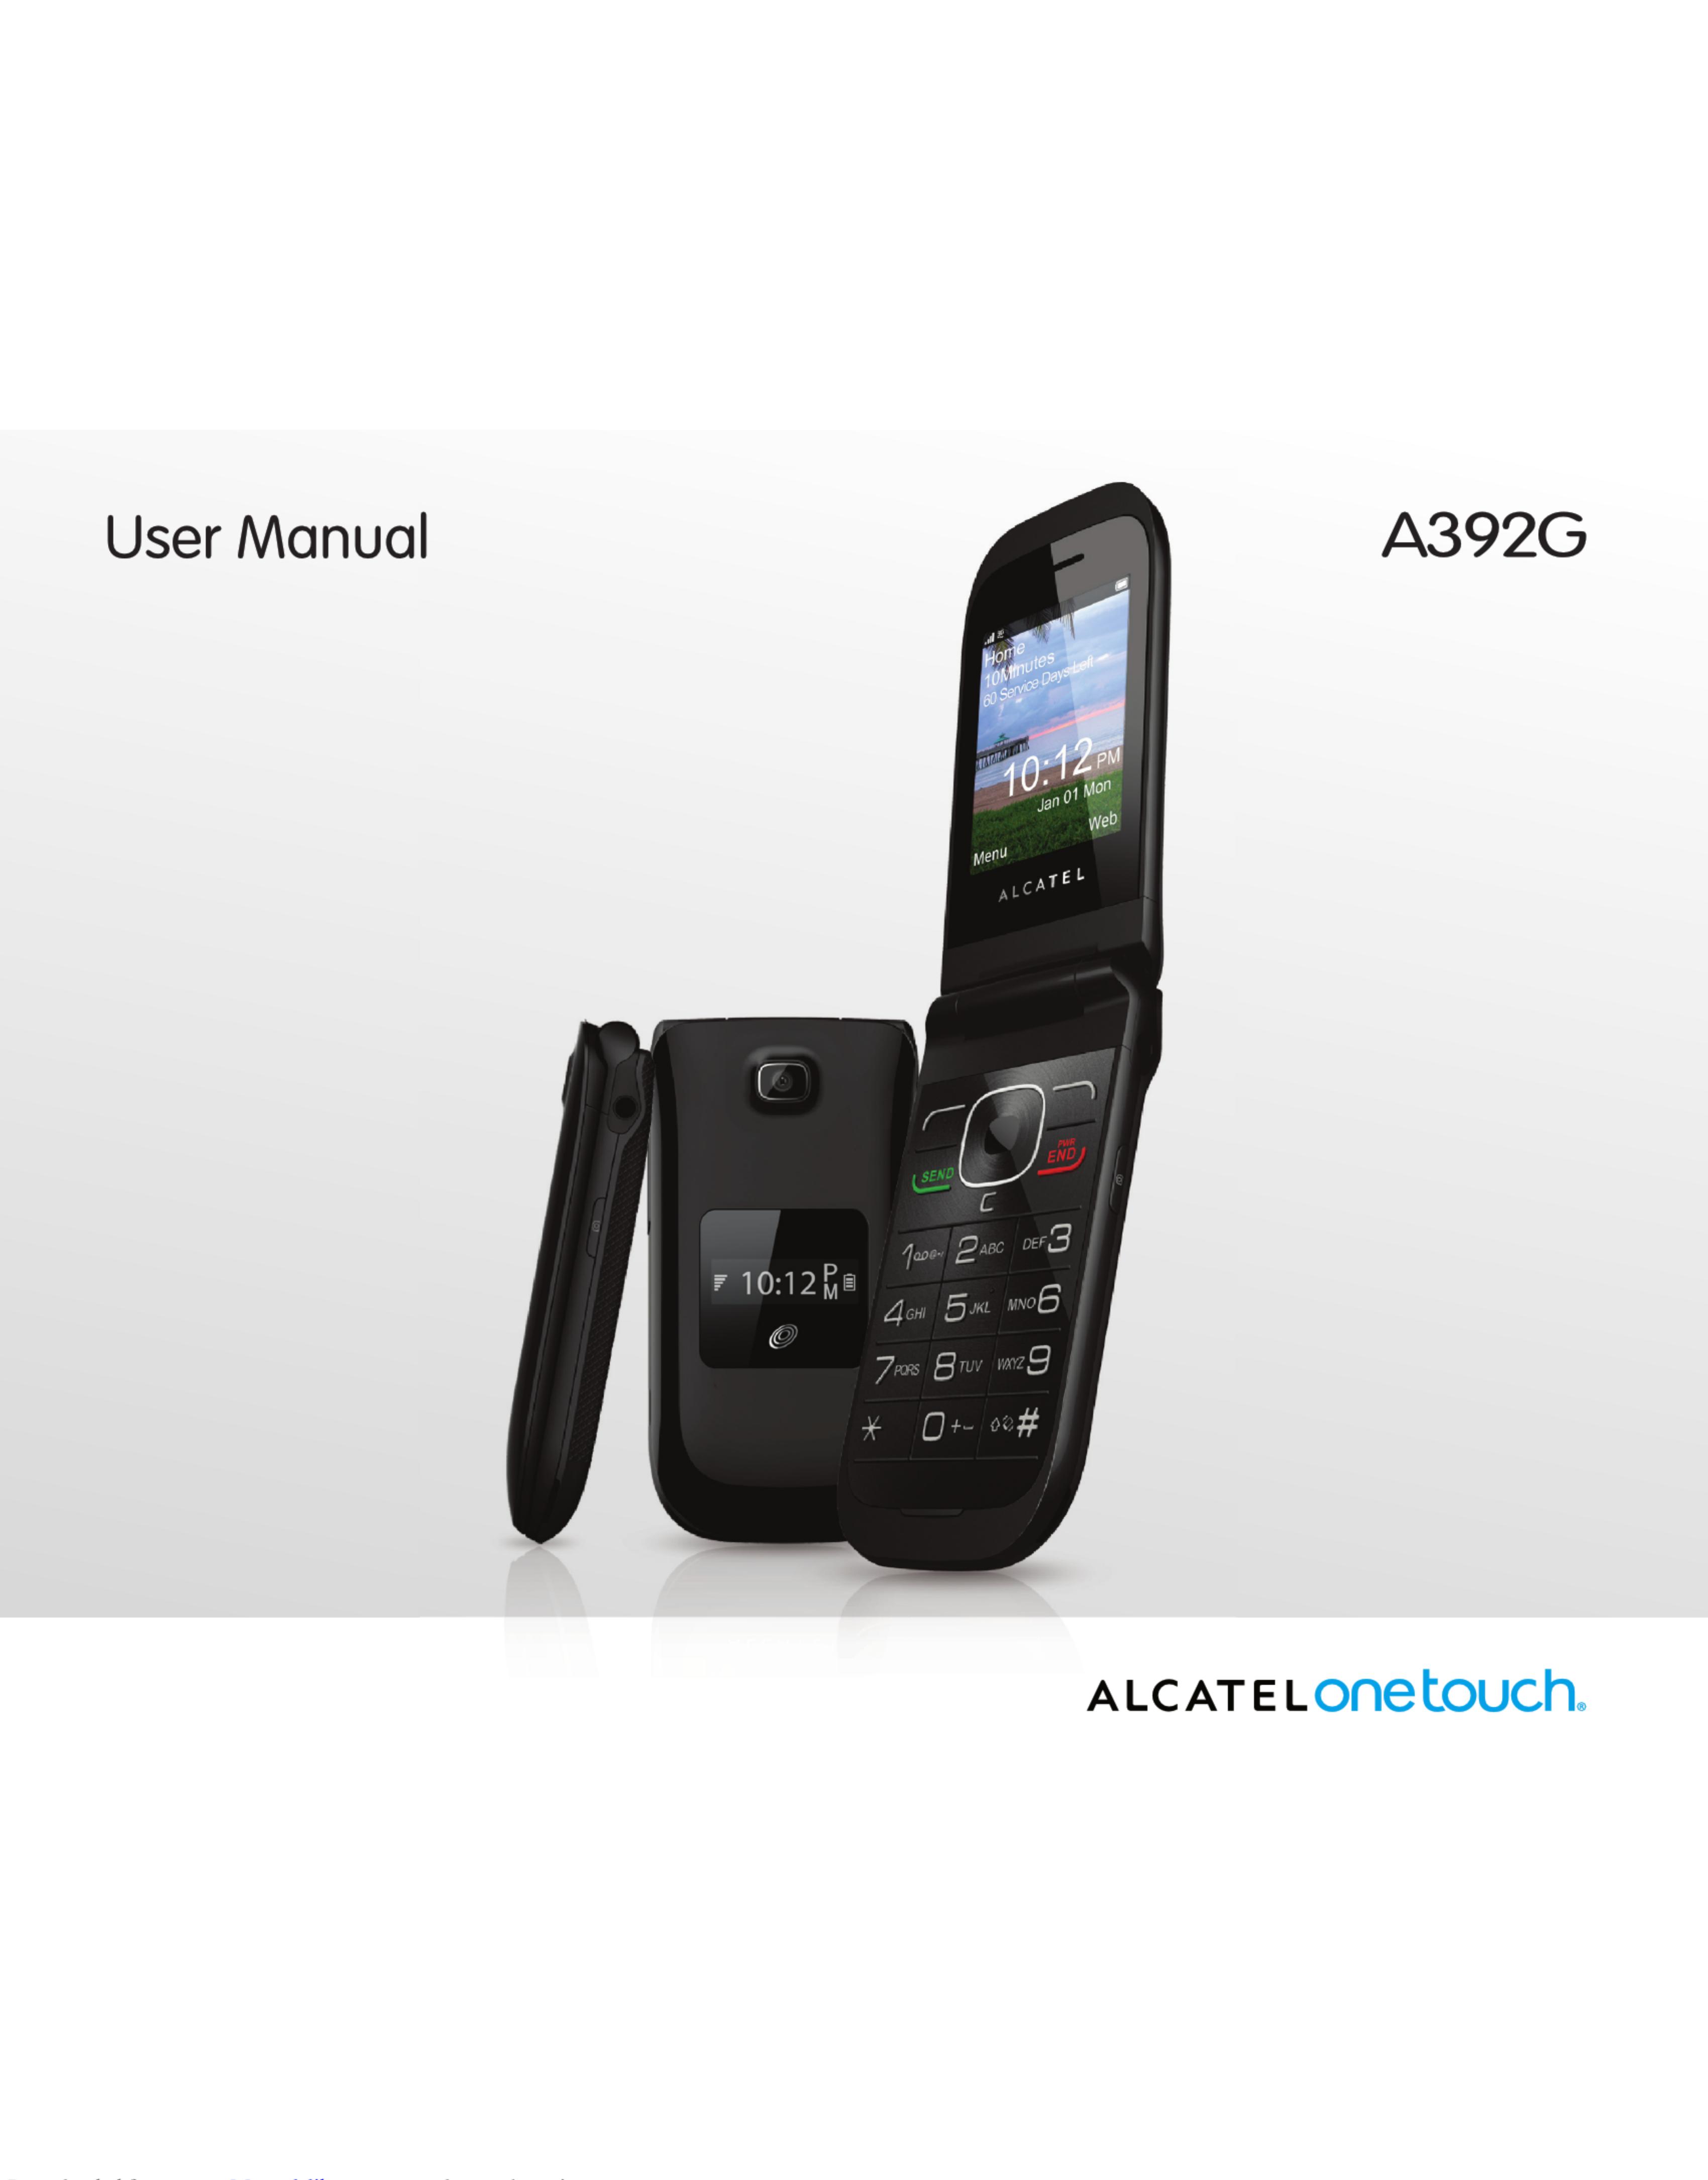 Alcatel A392G User Manual 1003028